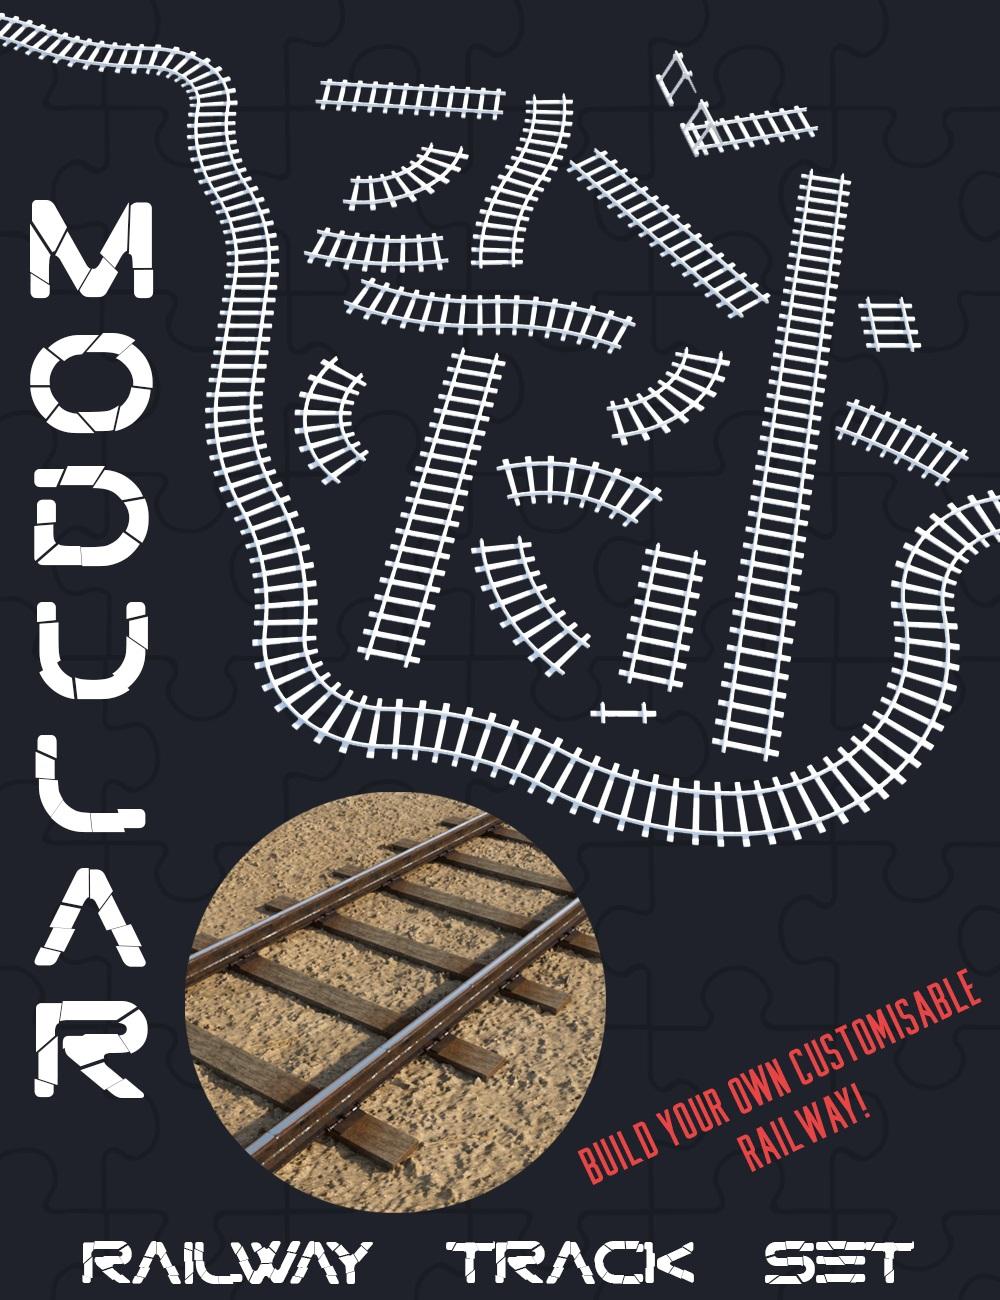 Modular Railway Track Set by: Censored, 3D Models by Daz 3D